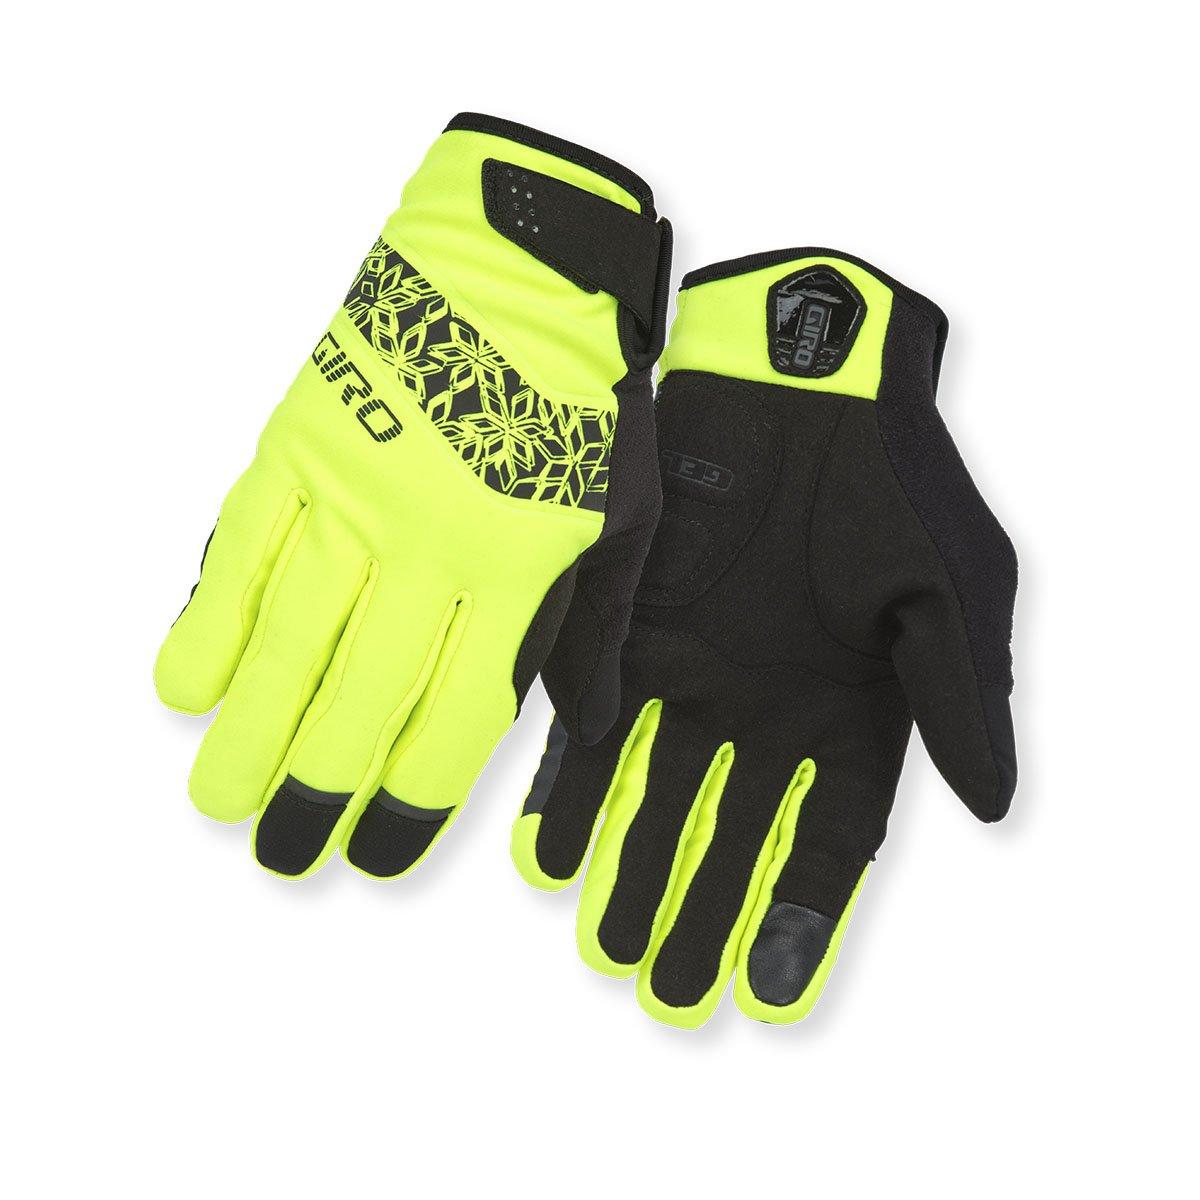 Giro レディース Candela グローブ Medium Highlight Yellow/Black B01636V1KM